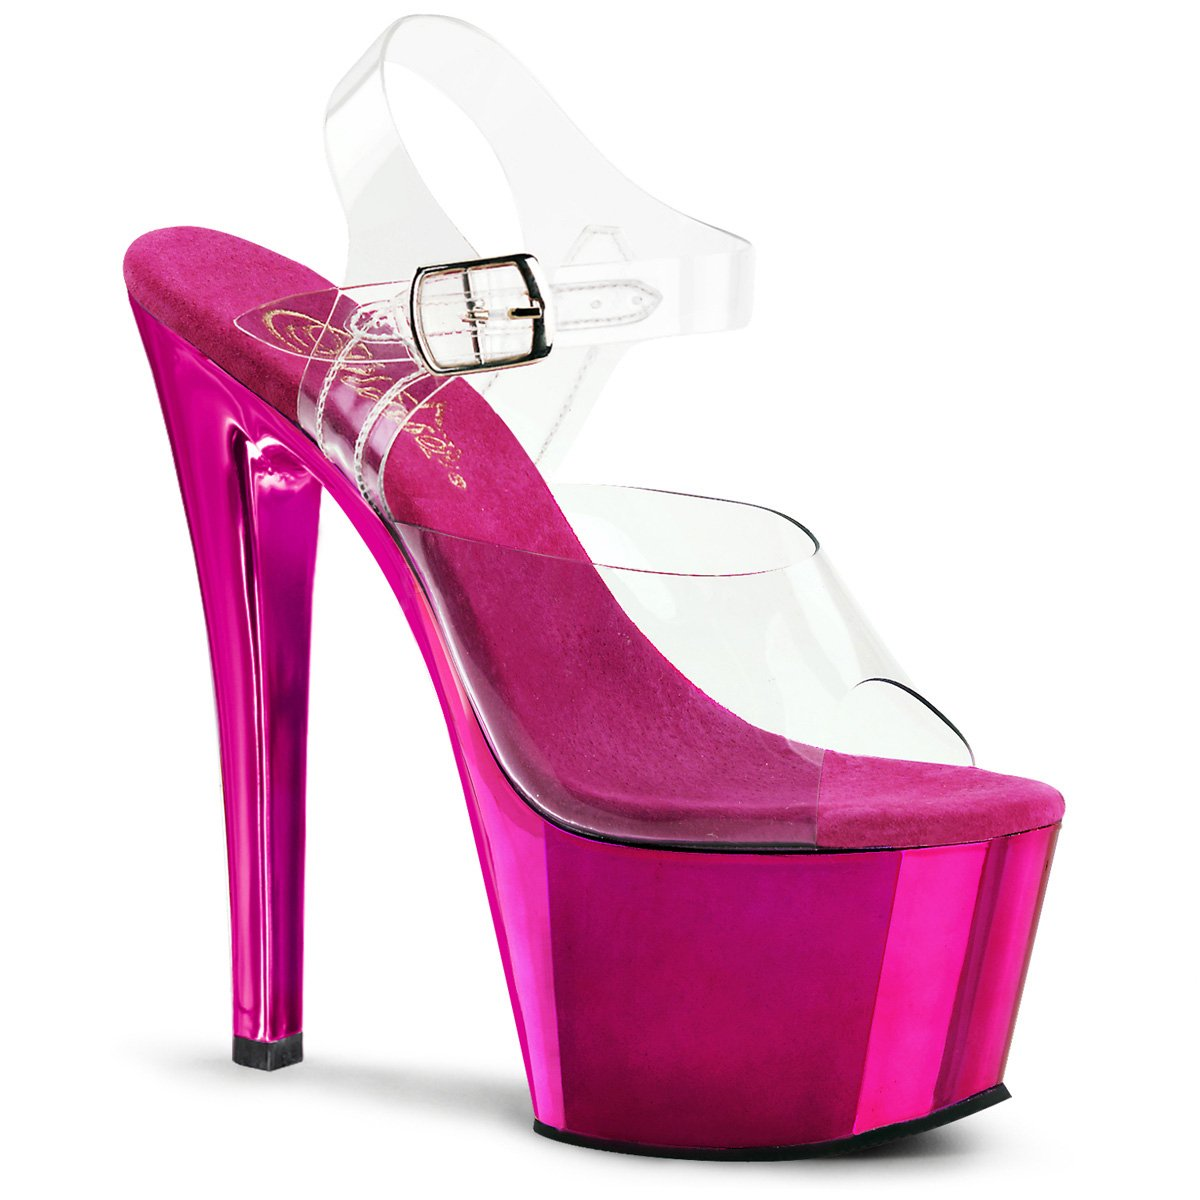 Pleaser Sky-308 - Sandalias con Plataforma Mujer 12 B(M) US|Clear/Hot Pink Chrome